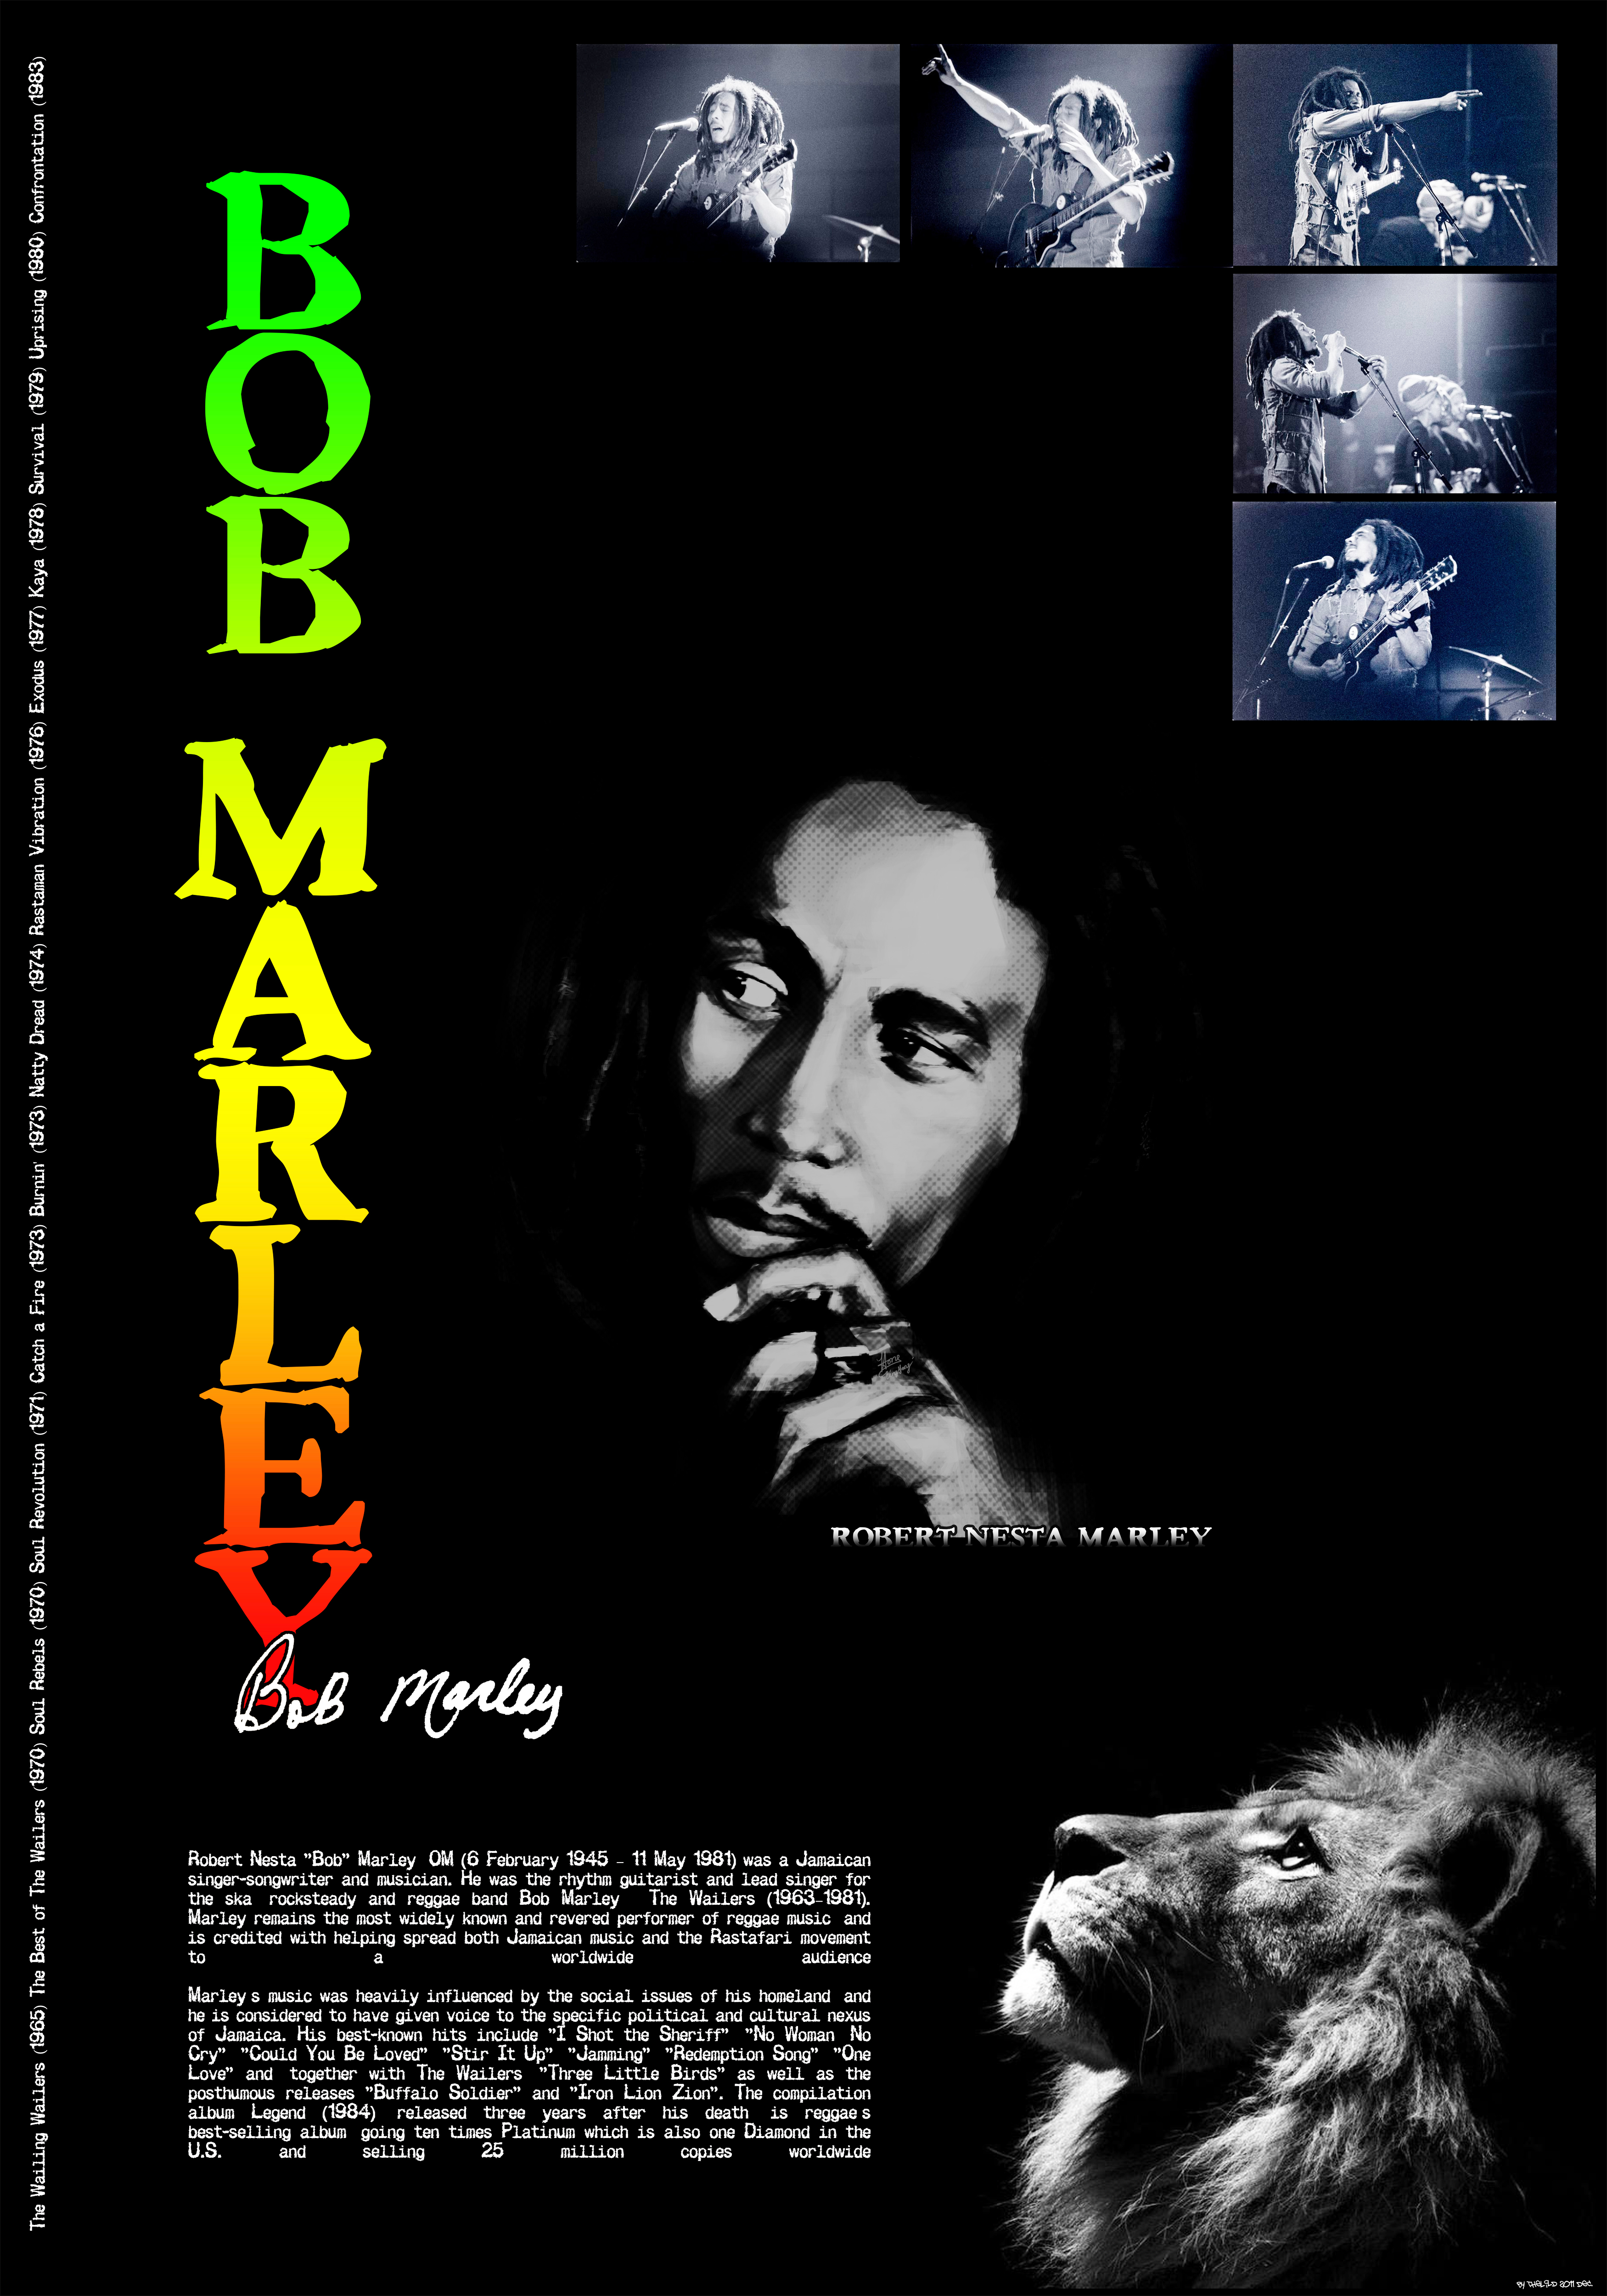 Bob Marley Poster 2011 By Foolstar